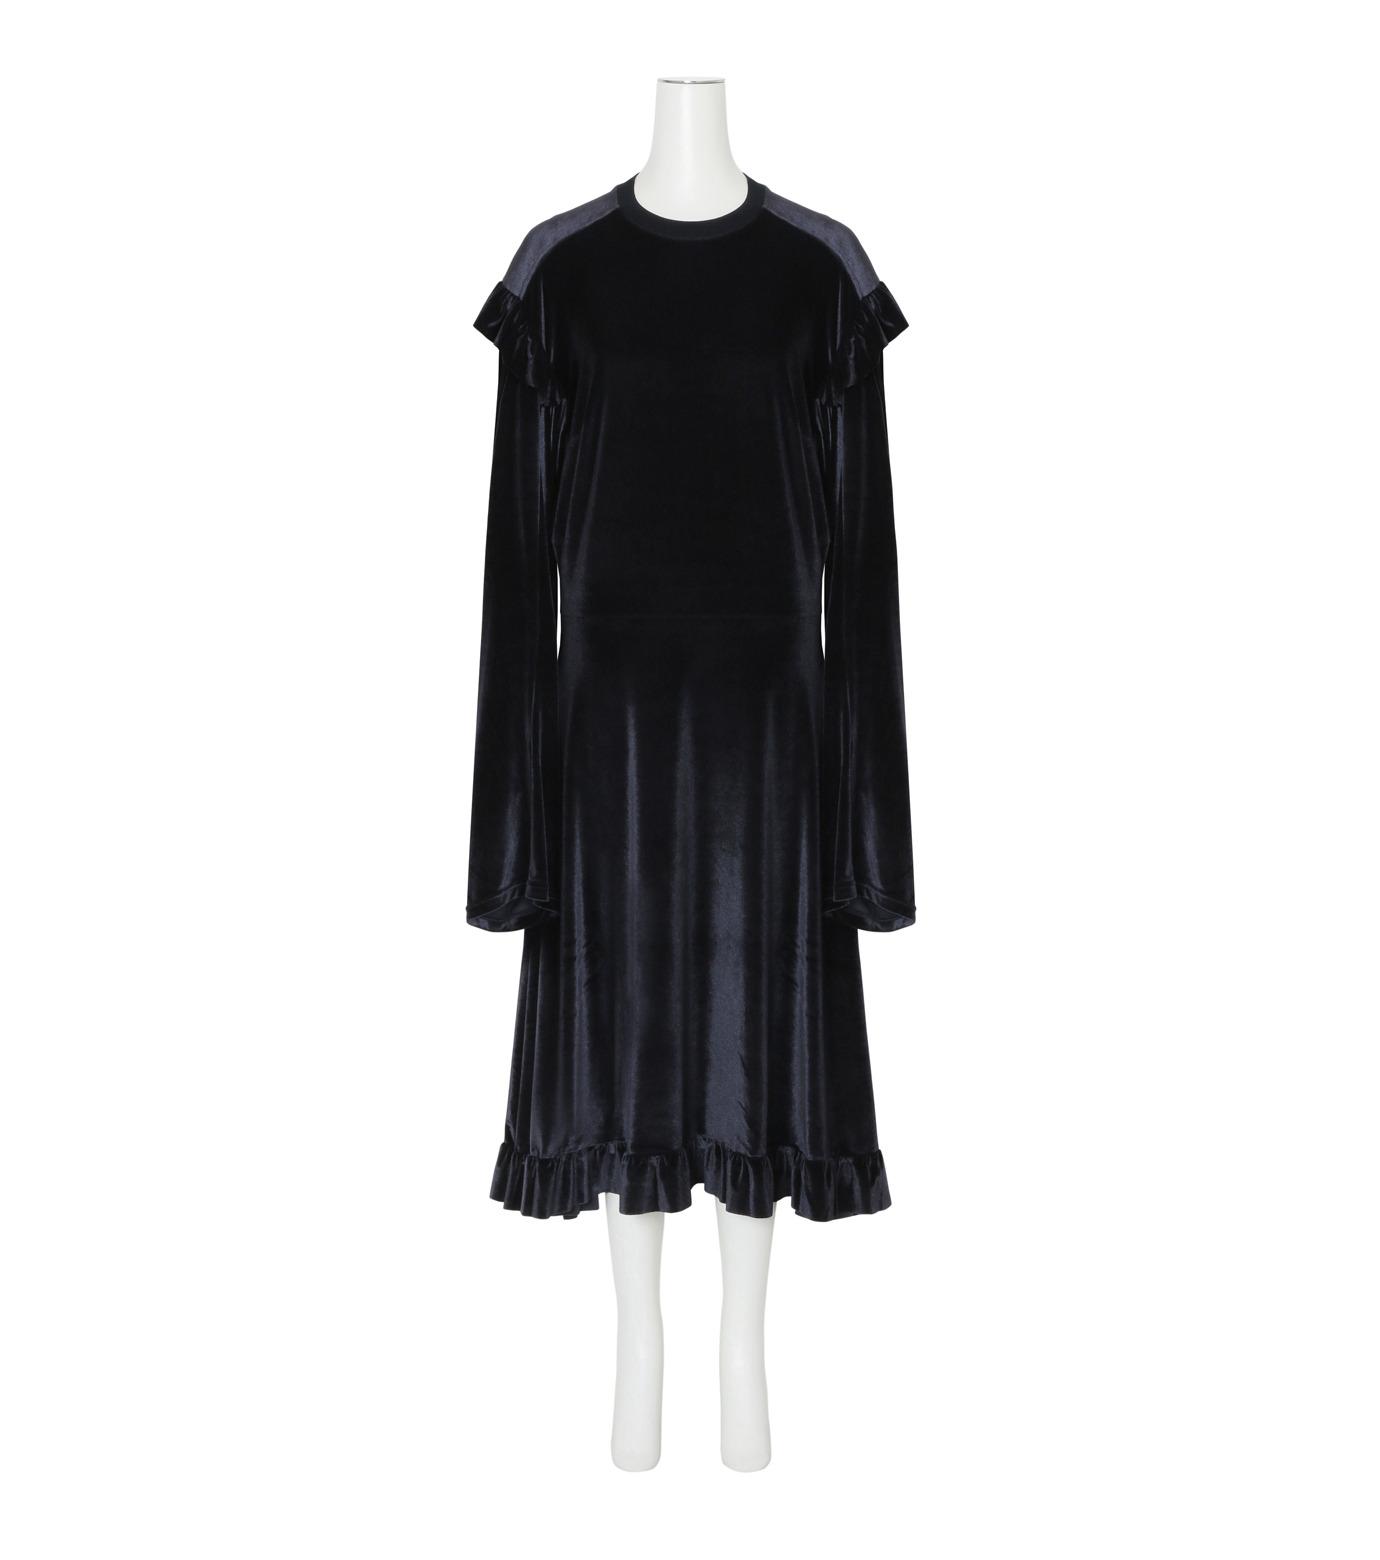 VETEMENTS(ヴェトモン)の70's Dress Velvet-BLACK(ワンピース/one piece)-WF17DR6-13 拡大詳細画像1